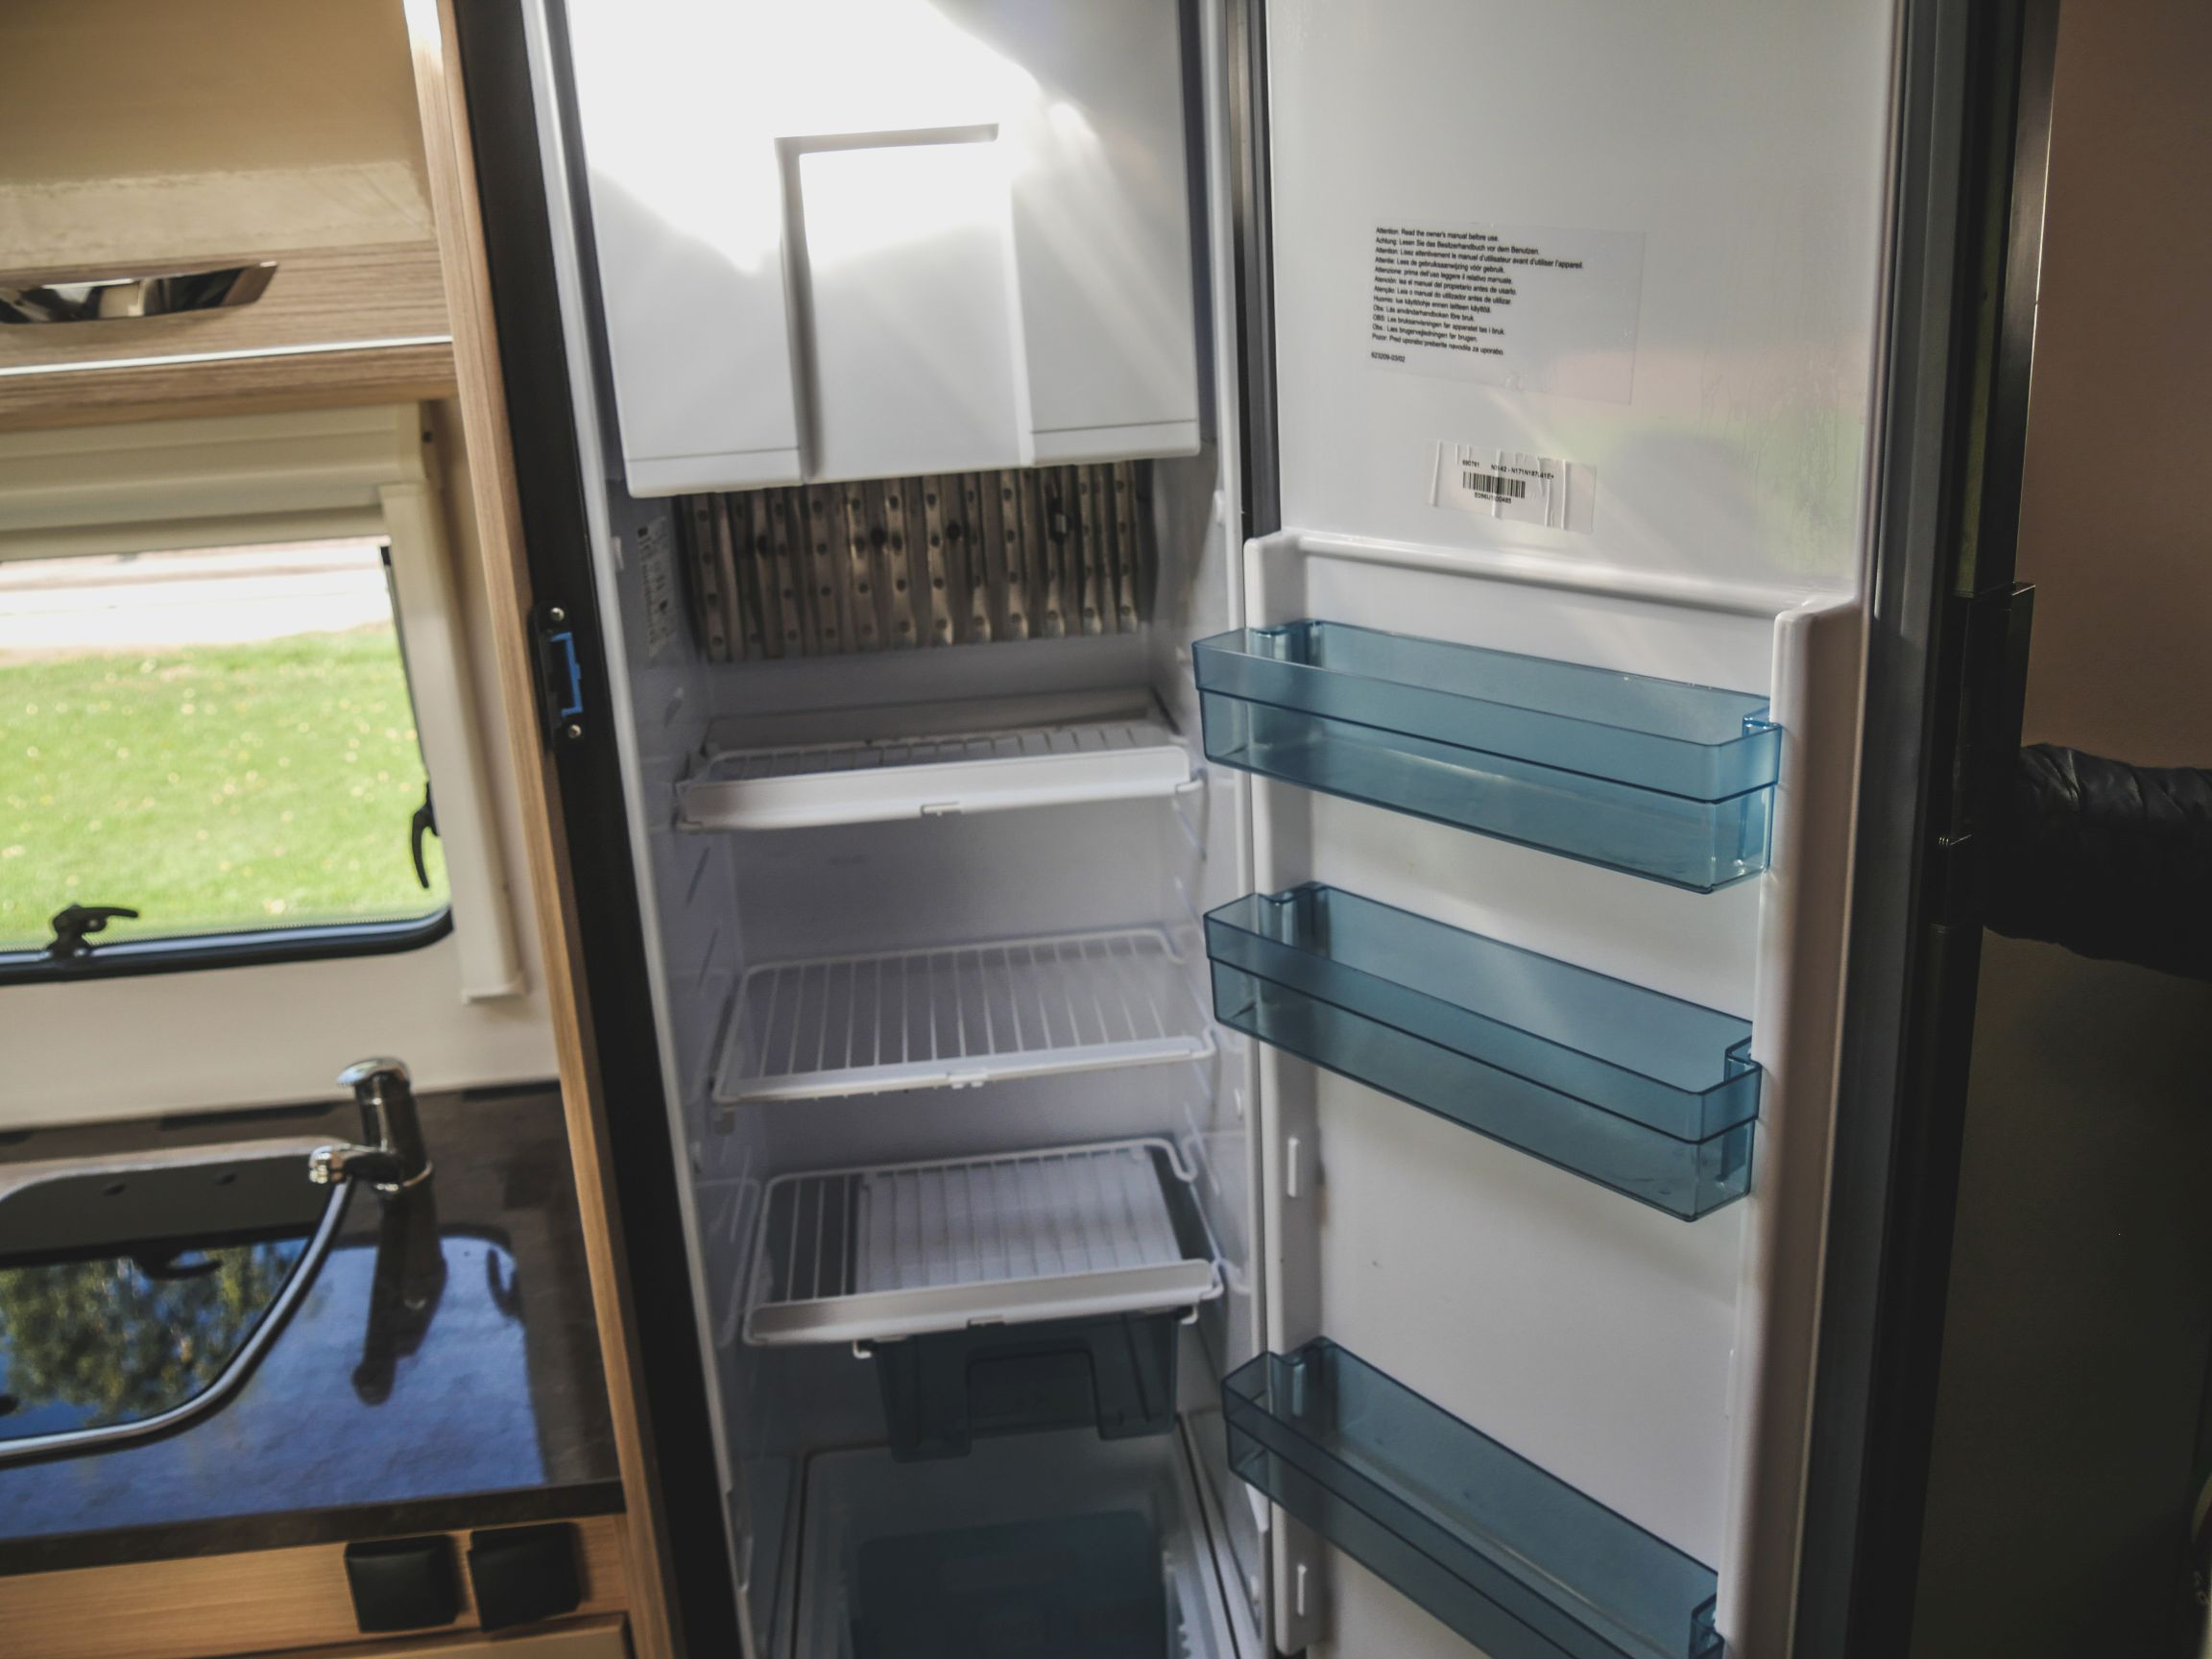 Bürstner A 660 interiér lednice